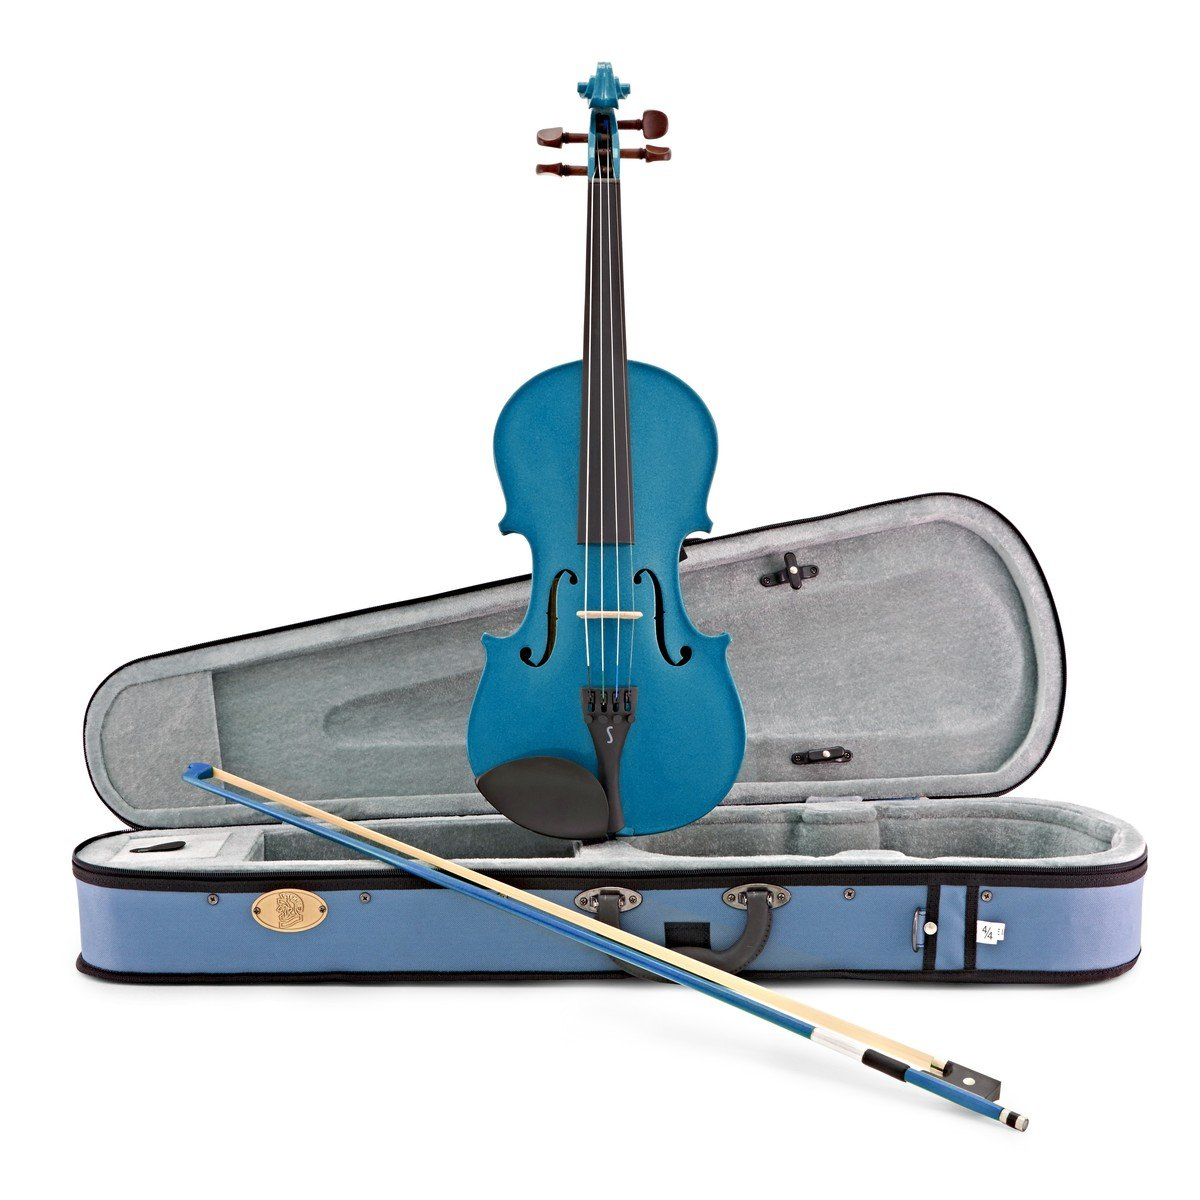 Stentor Harlequin 4/4 Violin Outfit - Marine Blue